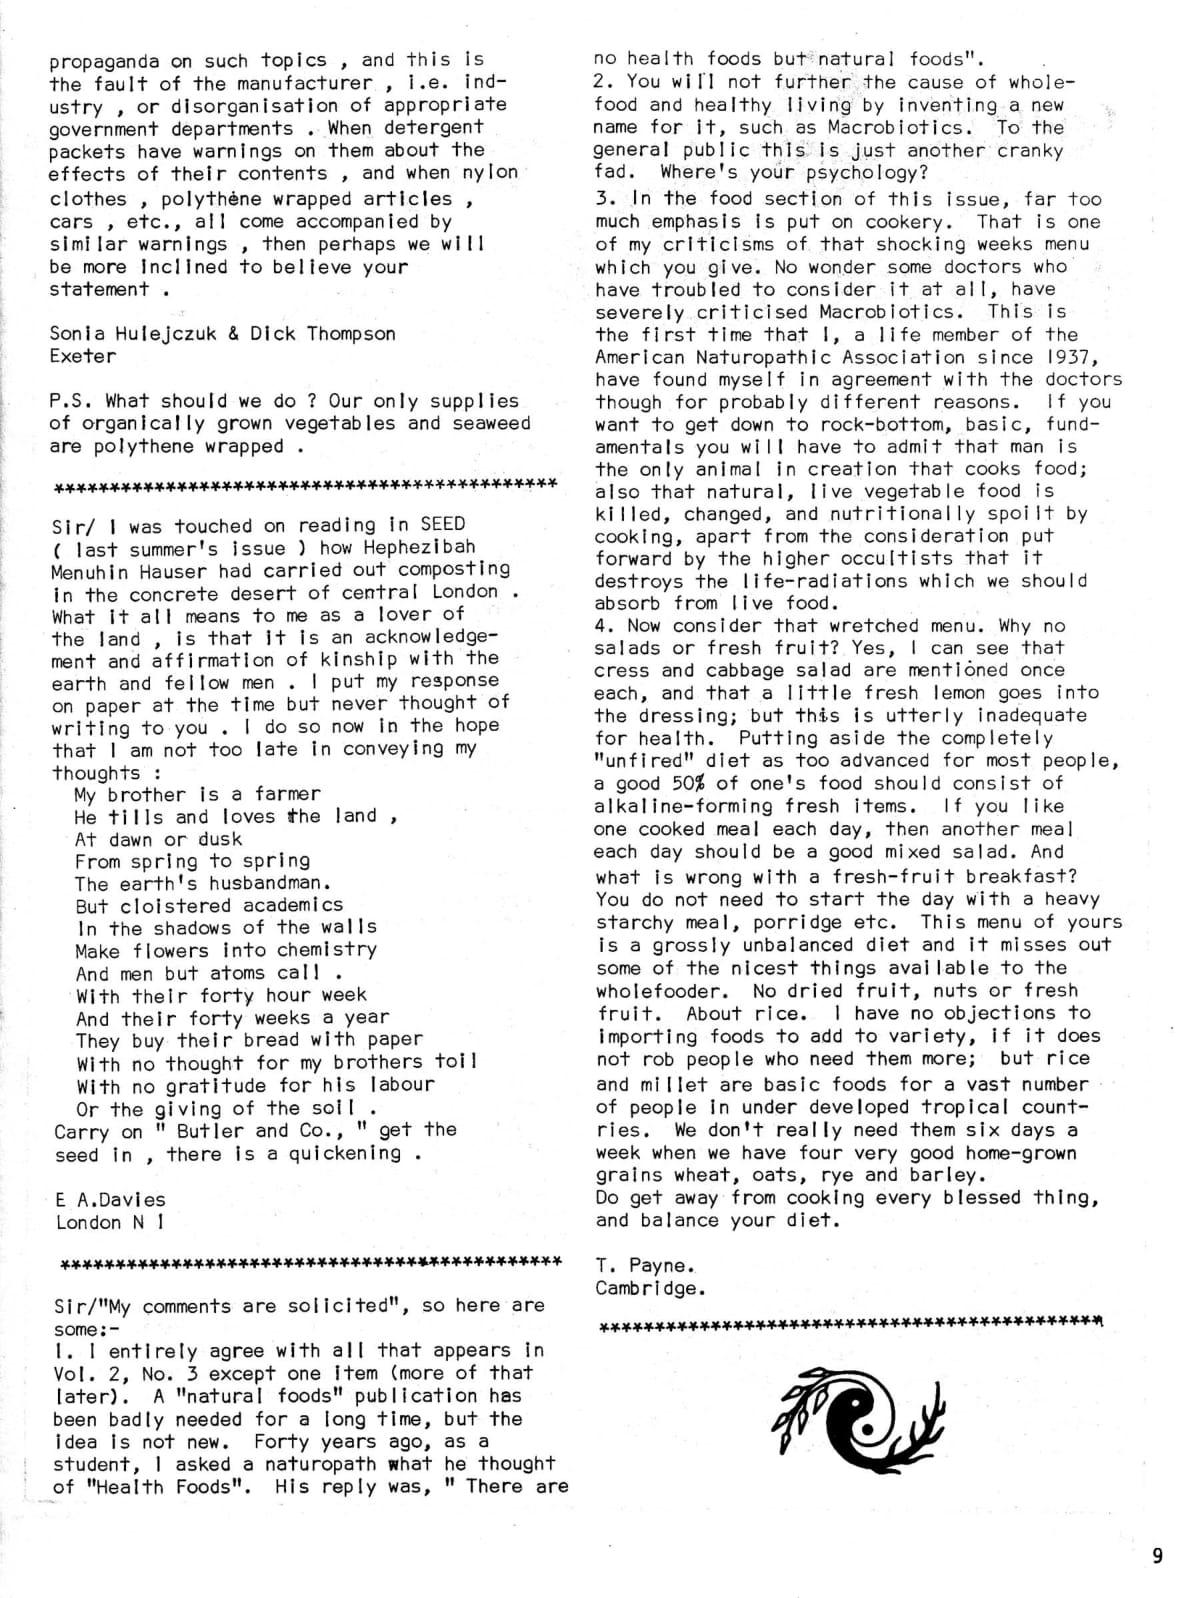 seed-v2-n5-may1973-09.jpg